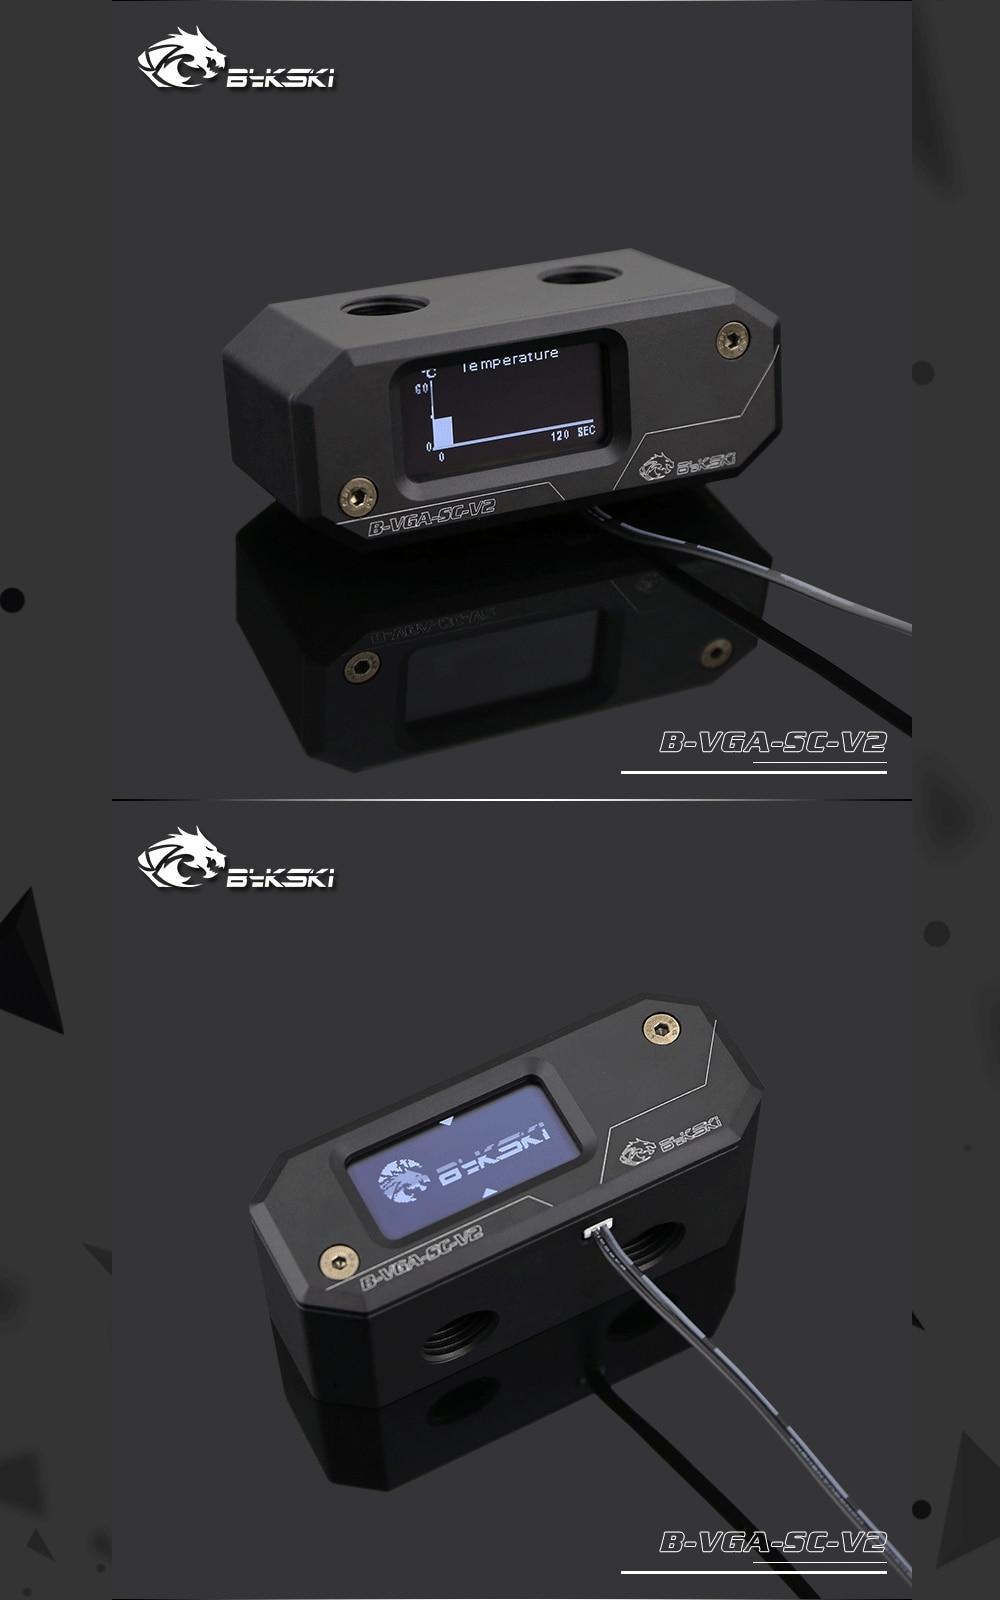 Bykski B-VGA-SC-V2, Bykski's GPU Блок мост цифровой дисплей термометр Замена модули, для Bykski's GPU блоки